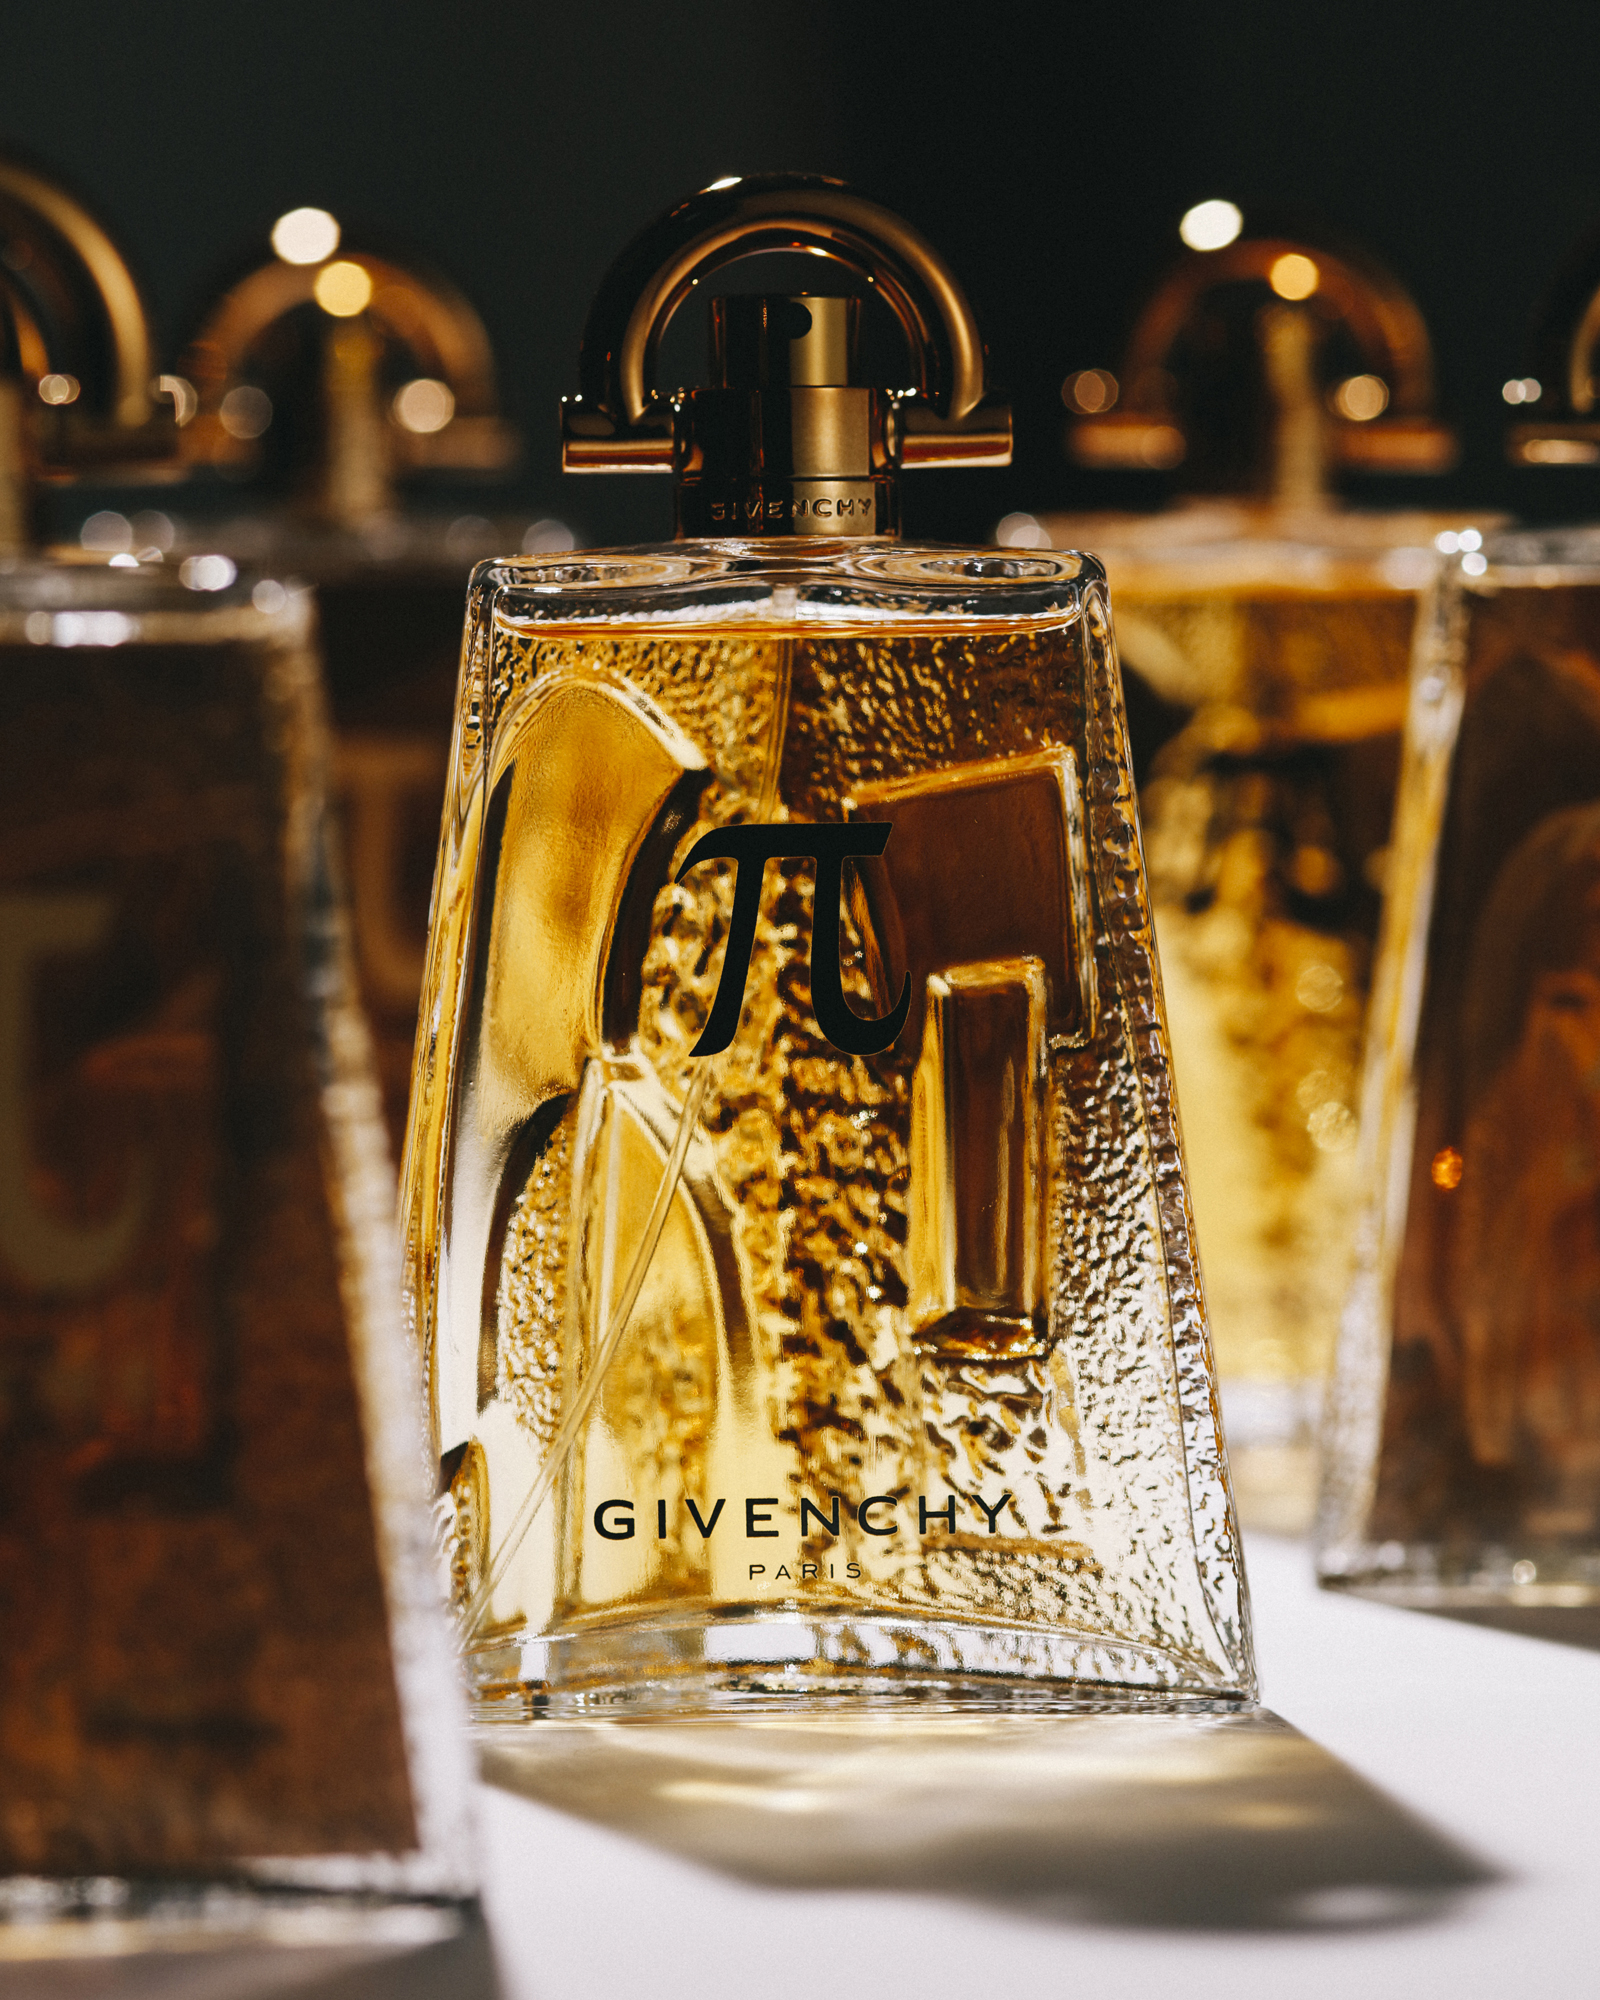 Givenchy-kristin-wolford-still-life-beauty-022.jpg